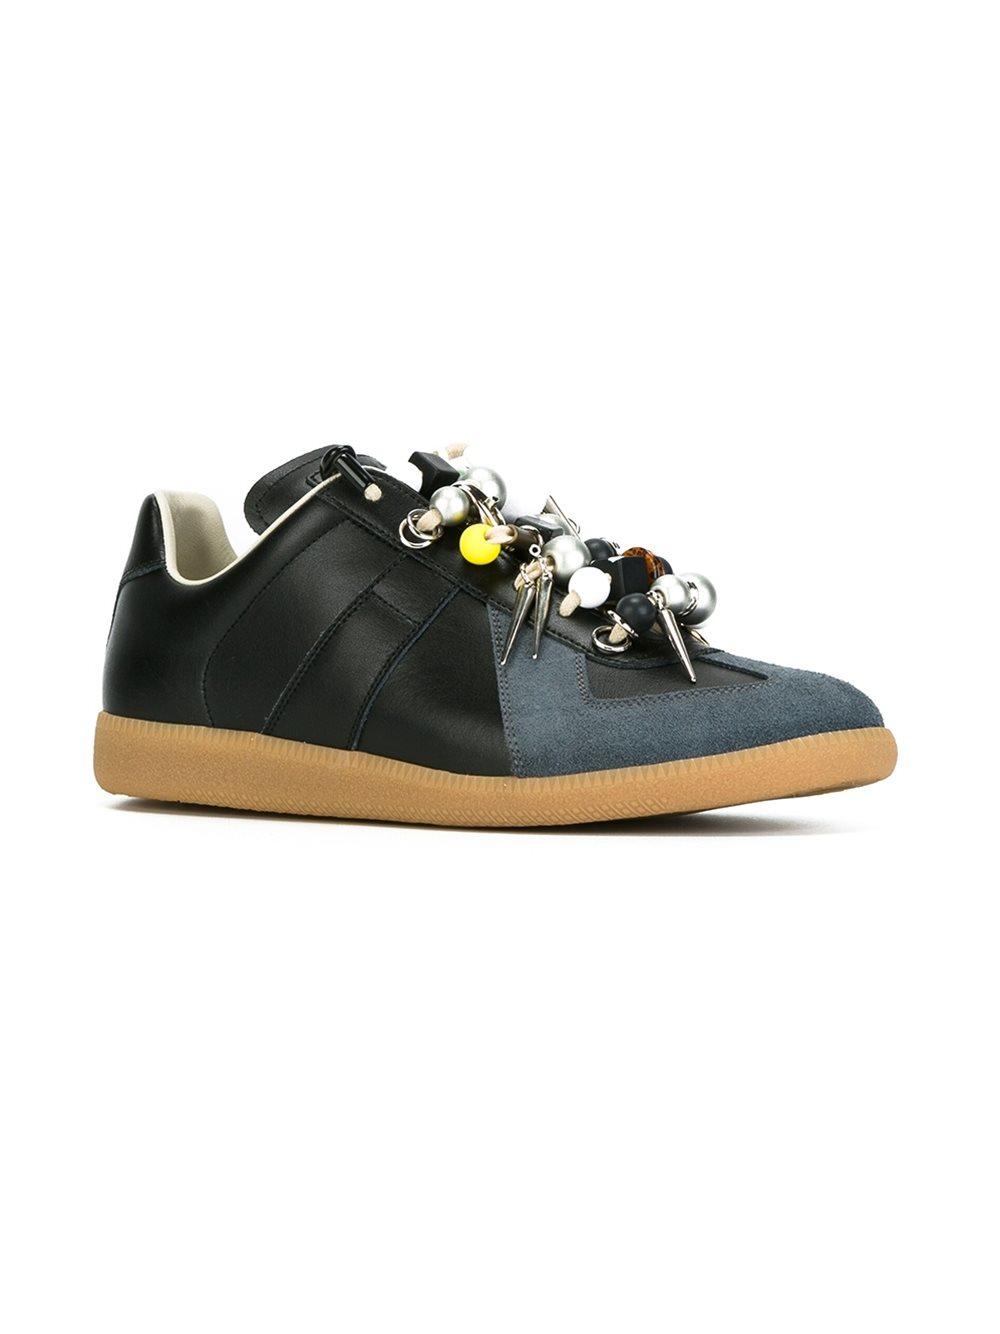 Lyst - Maison Margiela Replica Beaded Sneakers in Brown